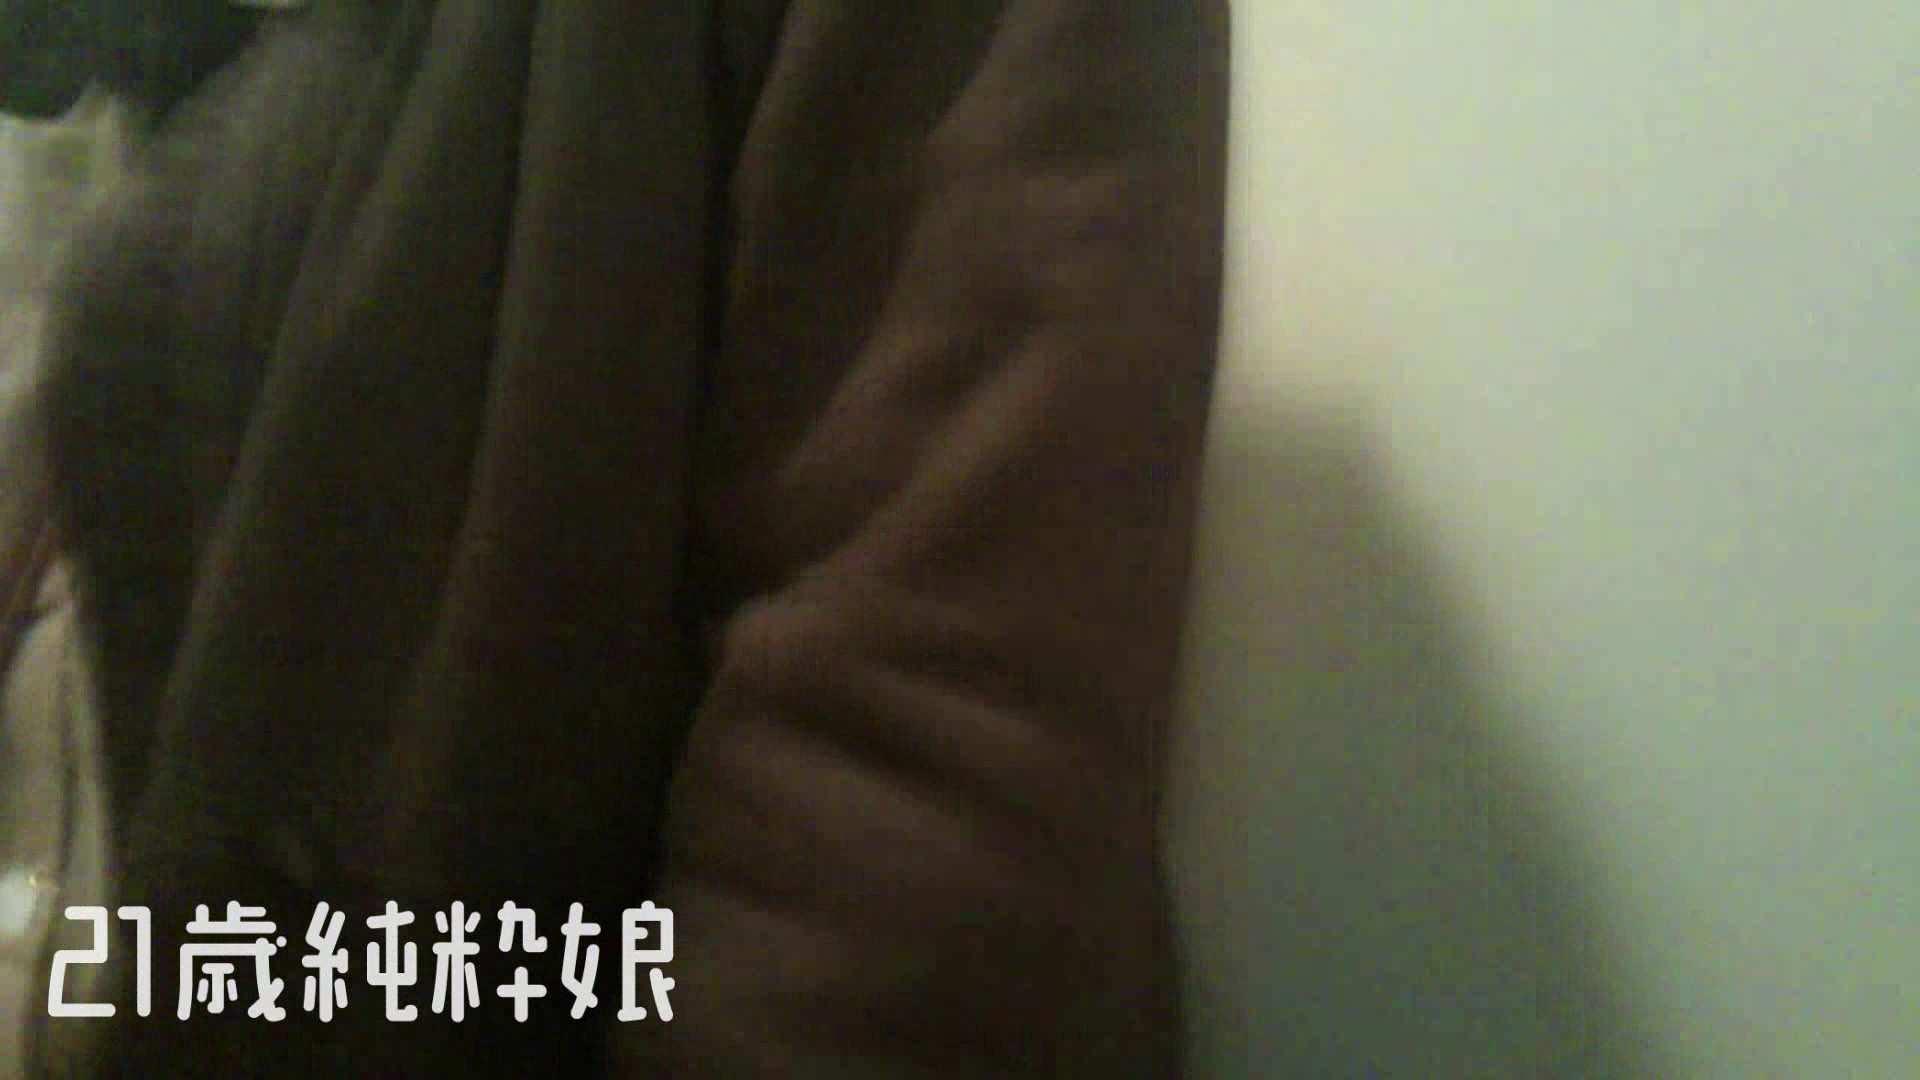 Gカップ21歳純粋嬢第2弾Vol.5 学校 オメコ動画キャプチャ 77pic 14